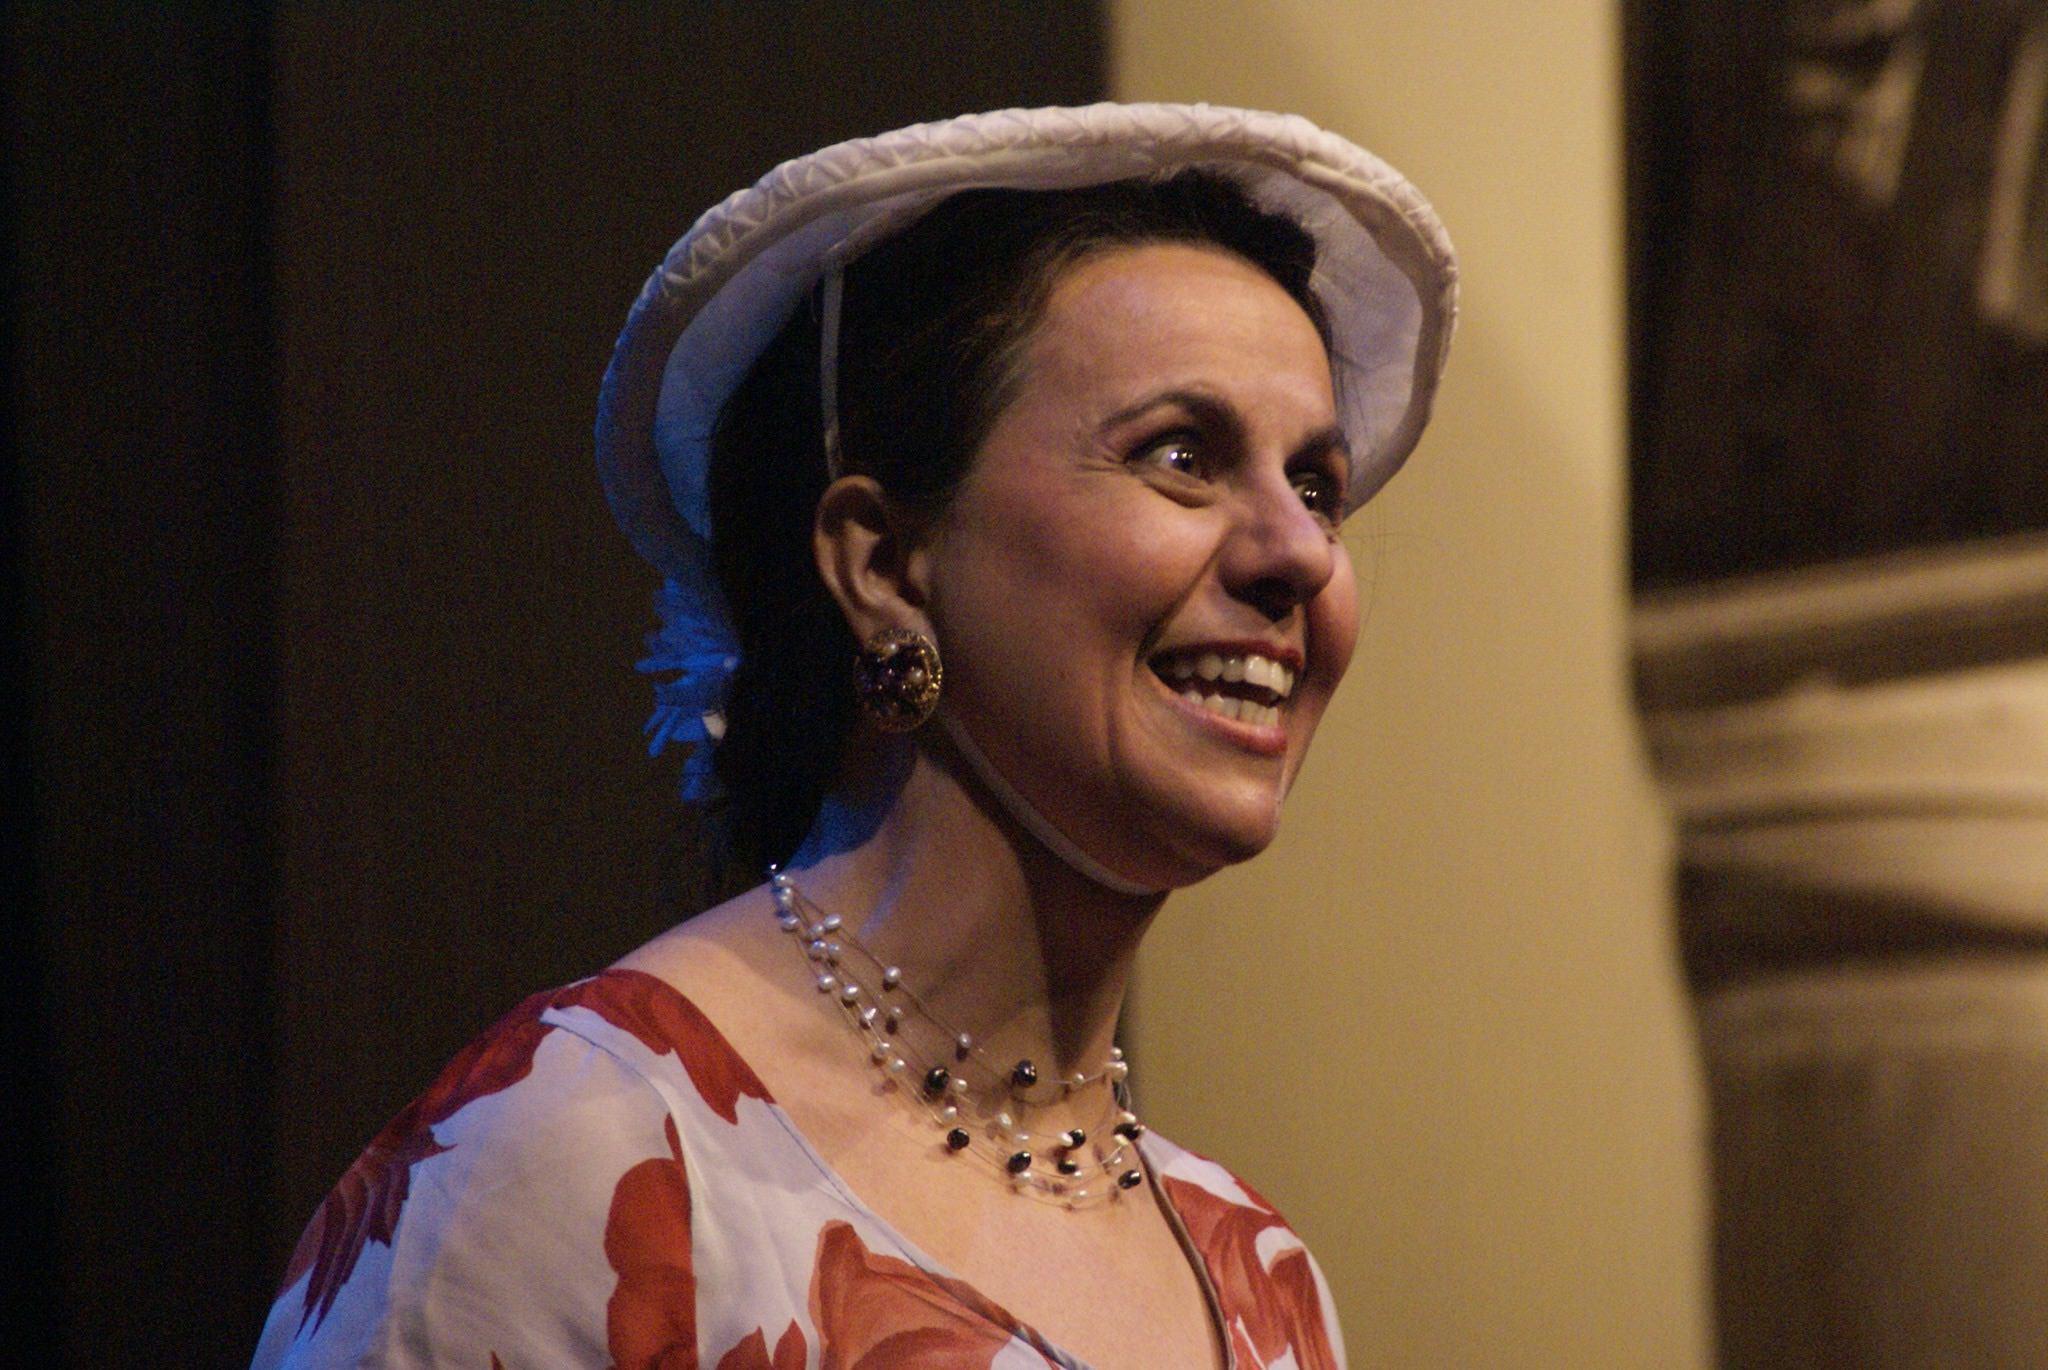 Barbara Baldini